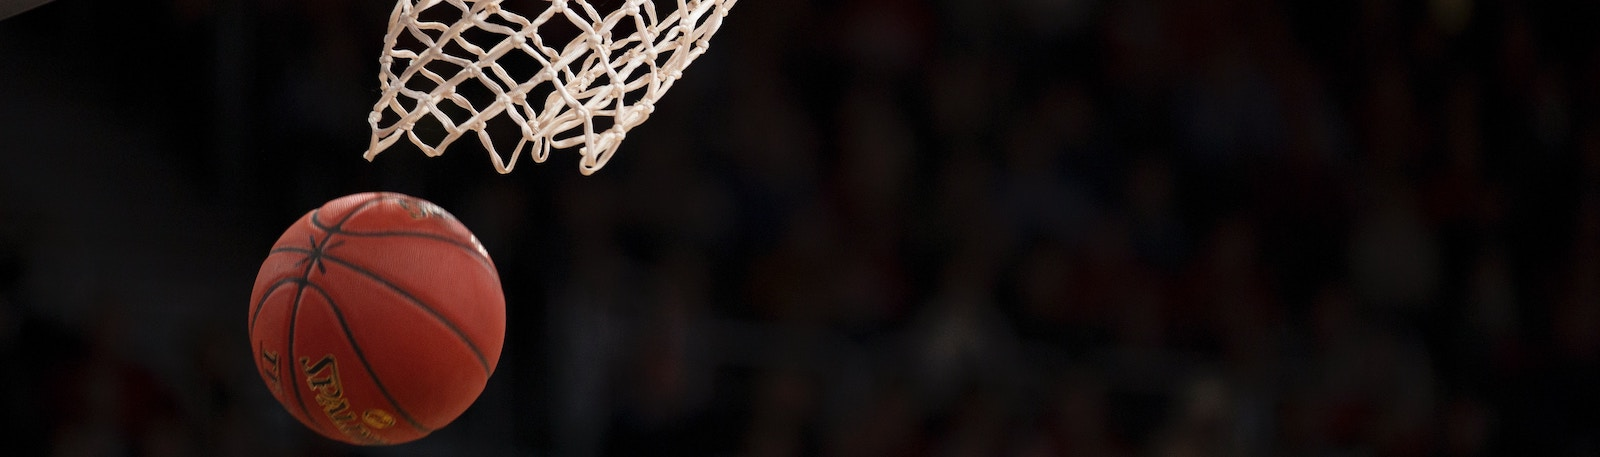 Basketball swishing through a net